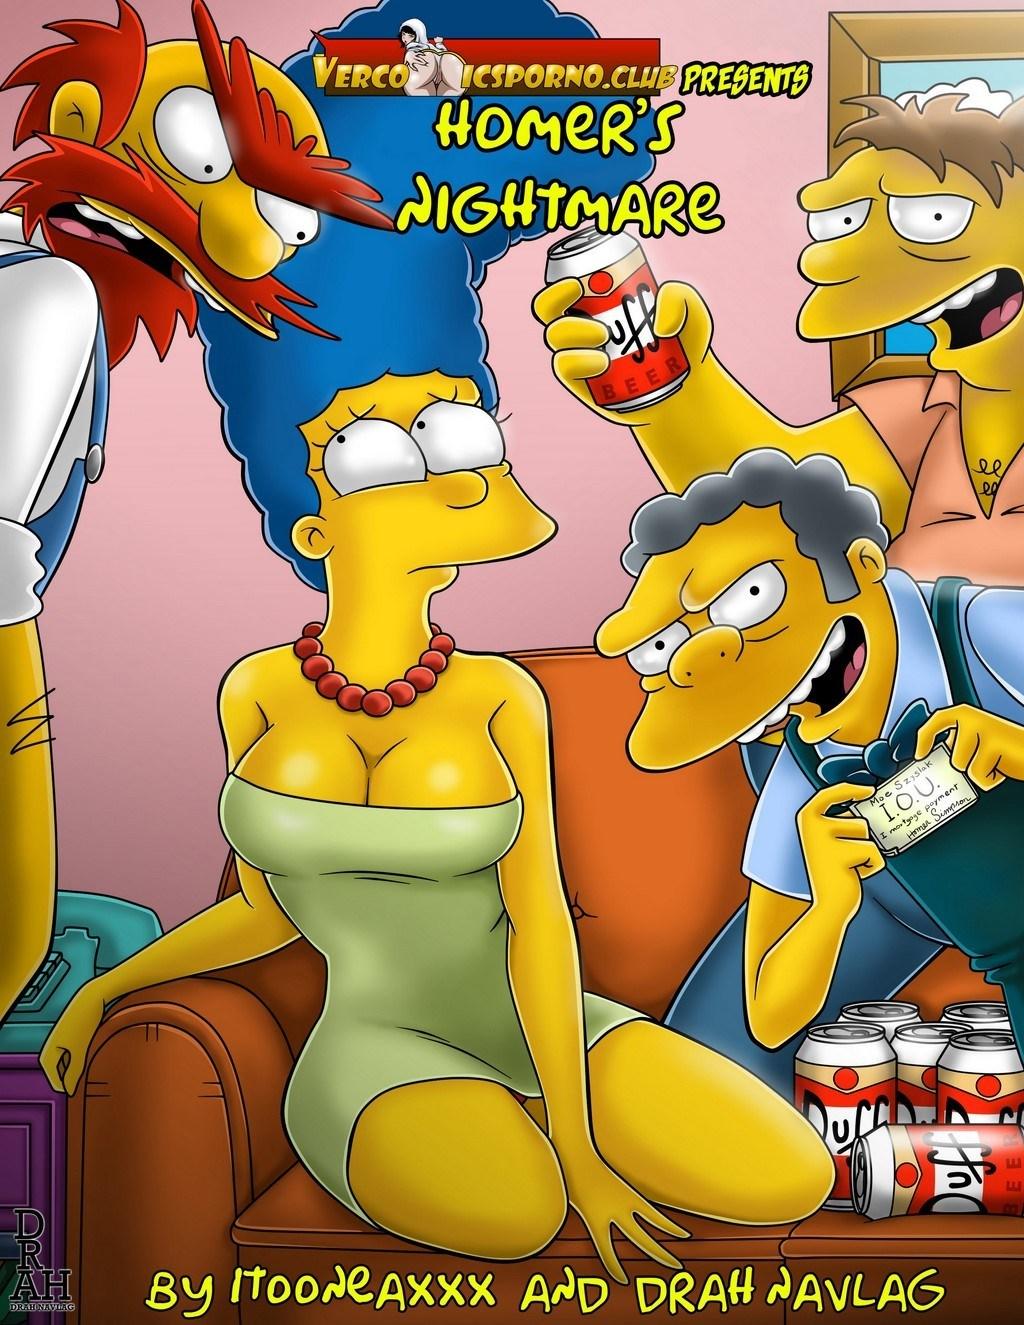 SureFap xxx porno The Simpsons - [VerComicsPorno (VCP)][Drah Navlag] - Homer's Nightmare